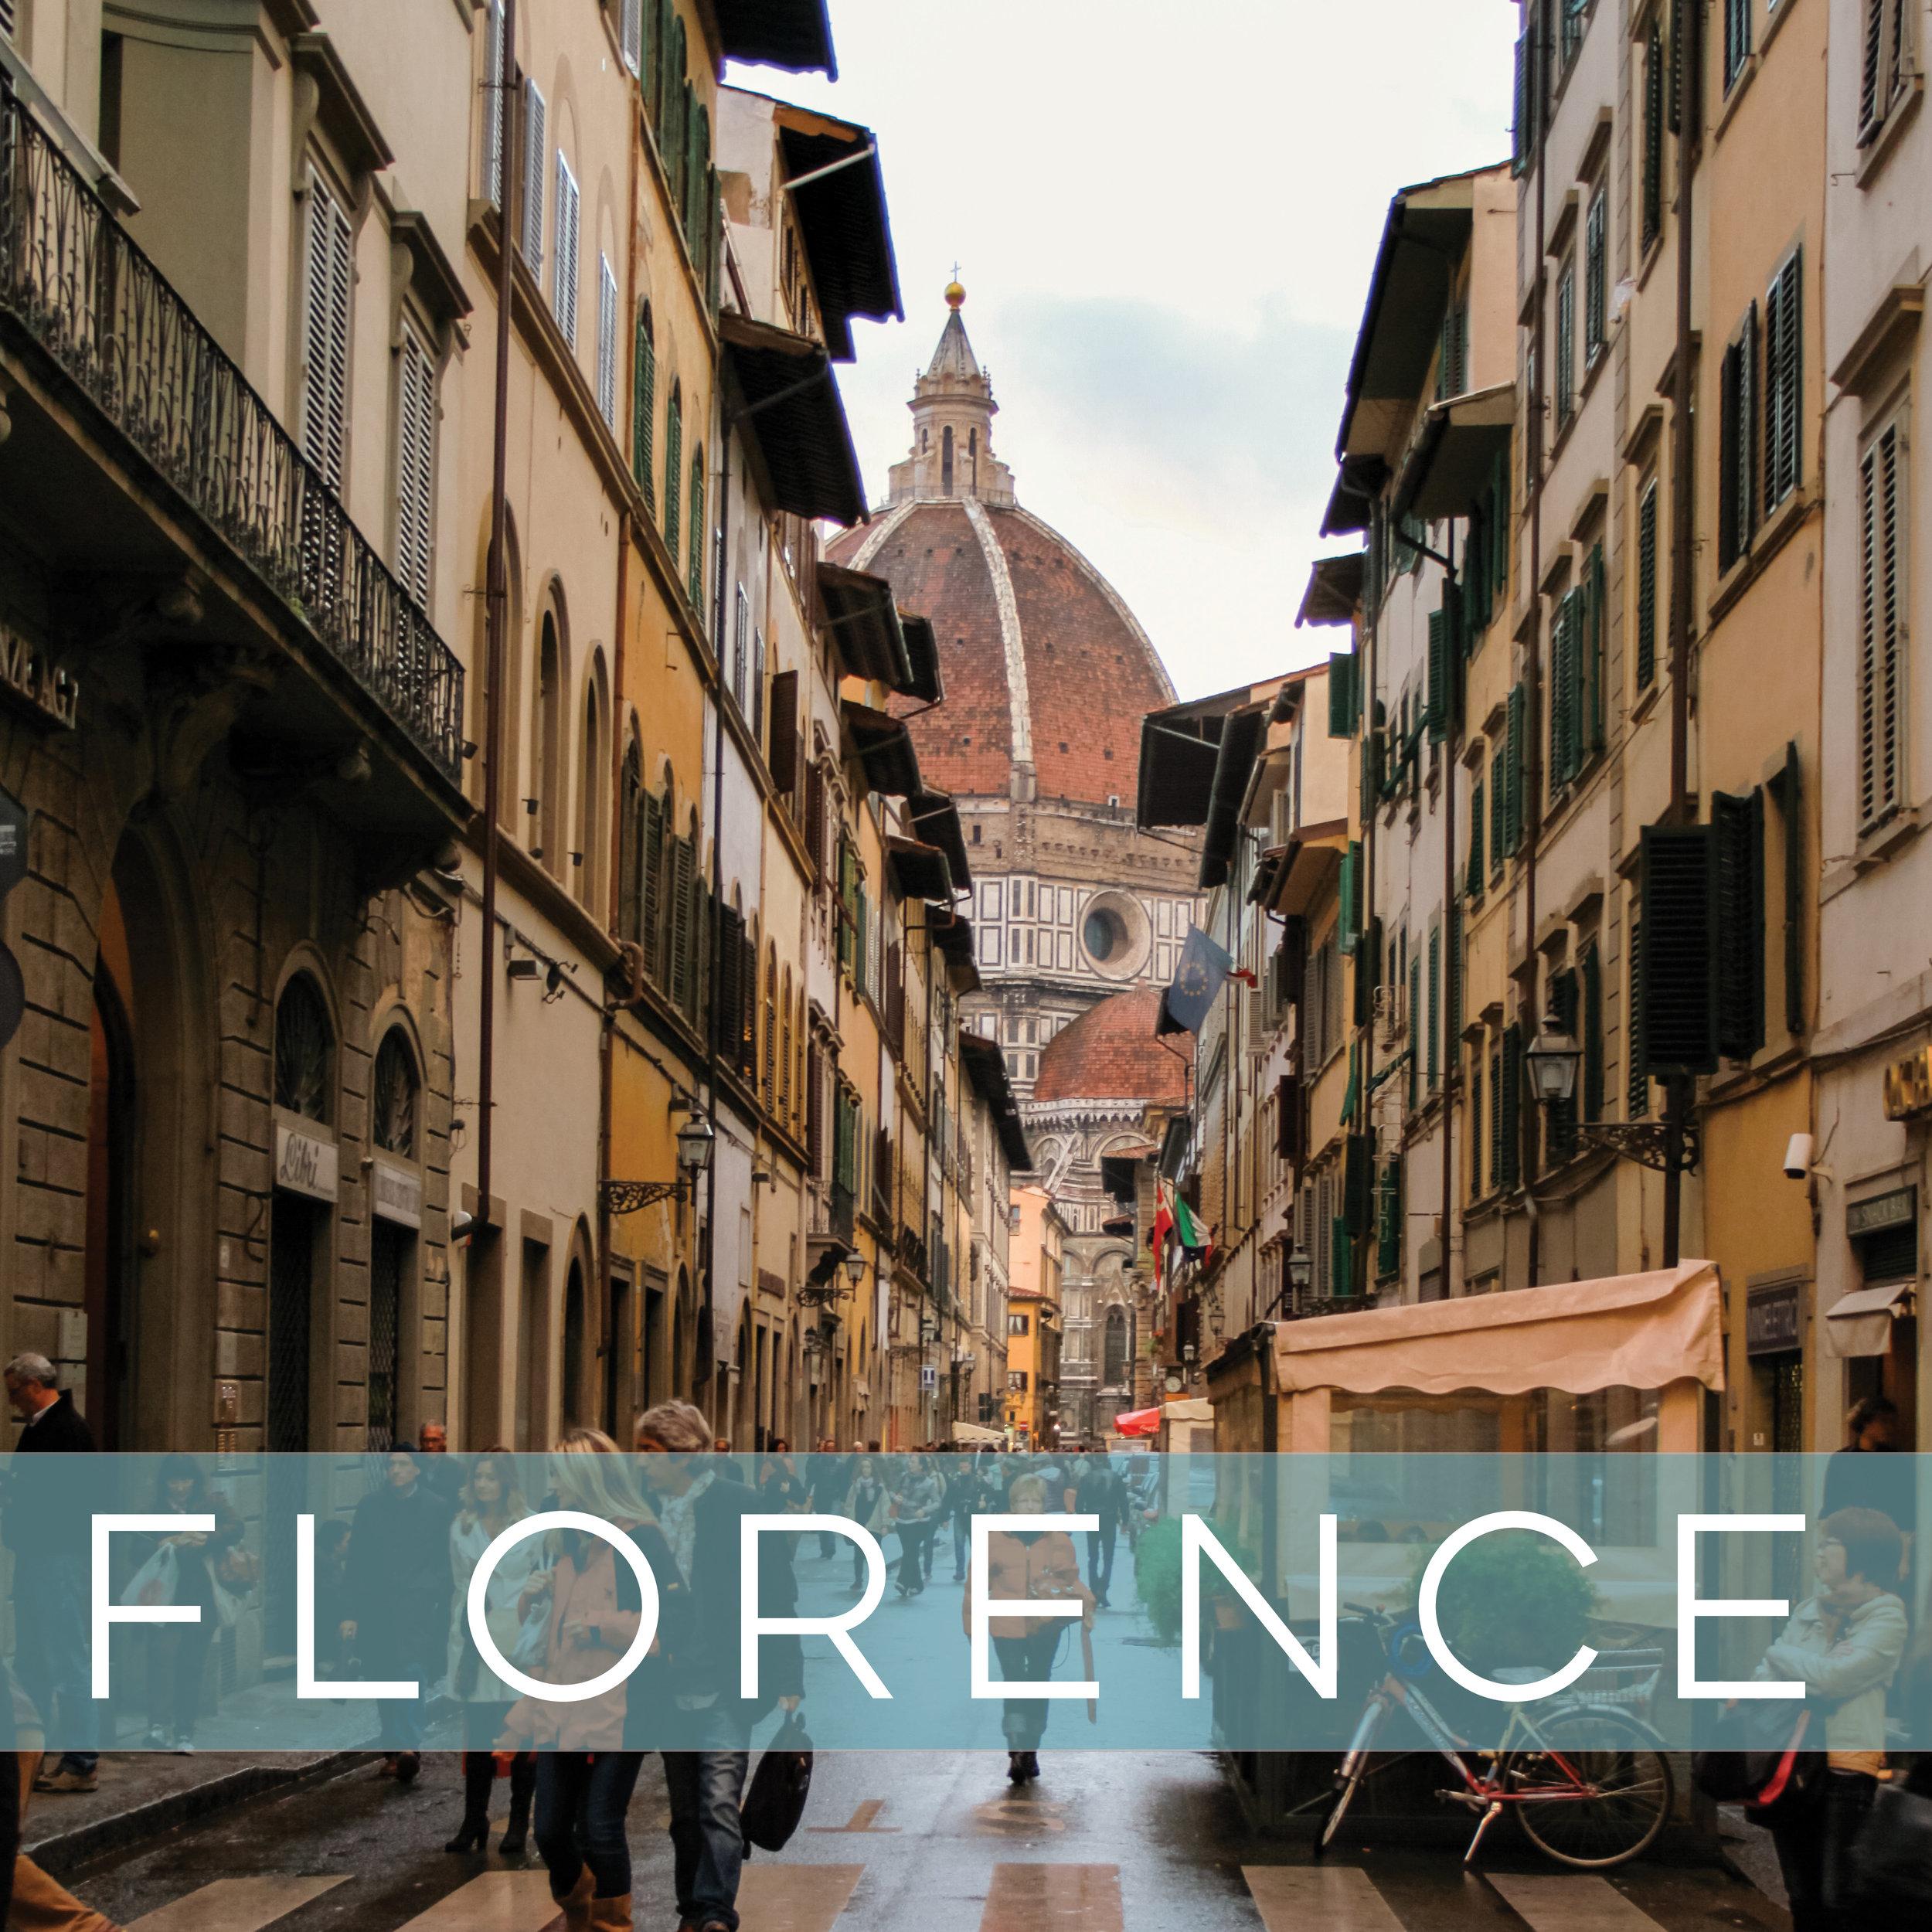 a guide to Firenze, Michelangelo's hometown